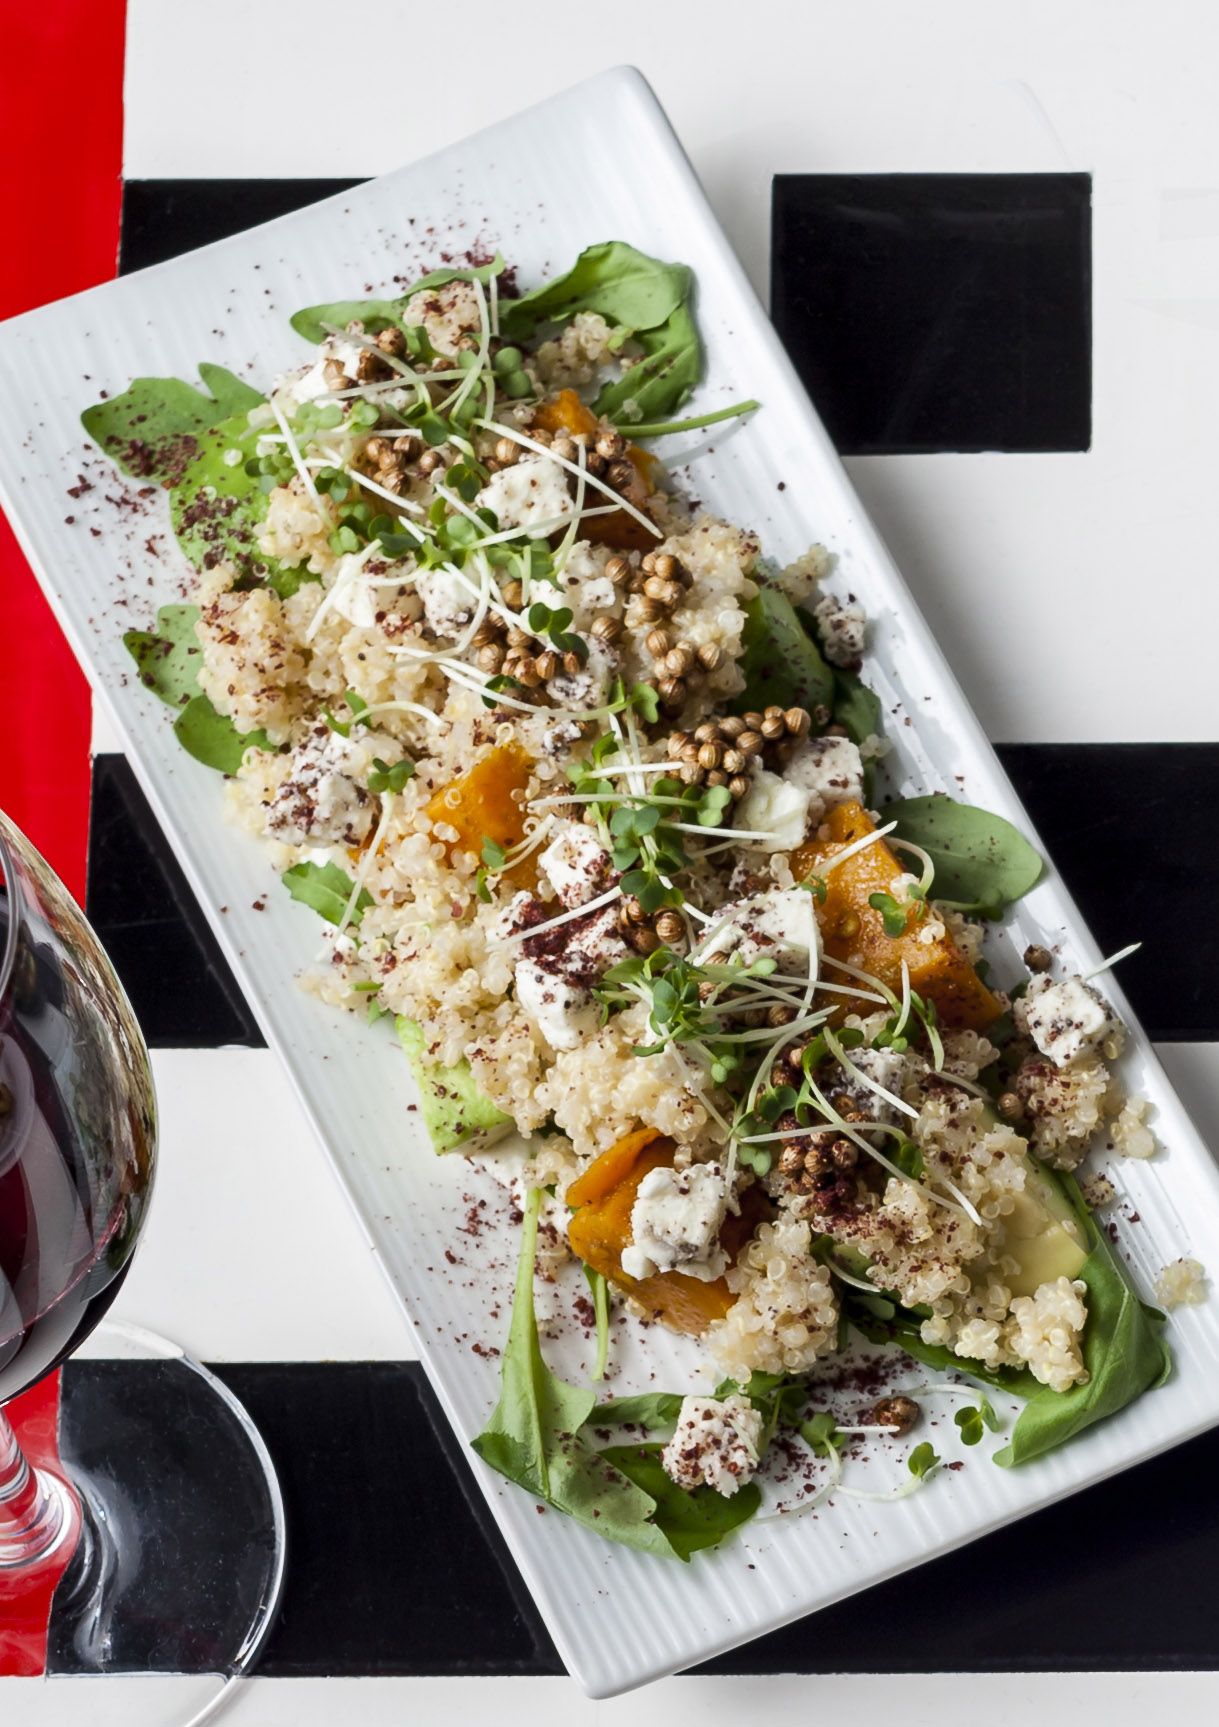 Roasted butternut and feta salad with quinoa, avocado and sumac - best quinoa recipes